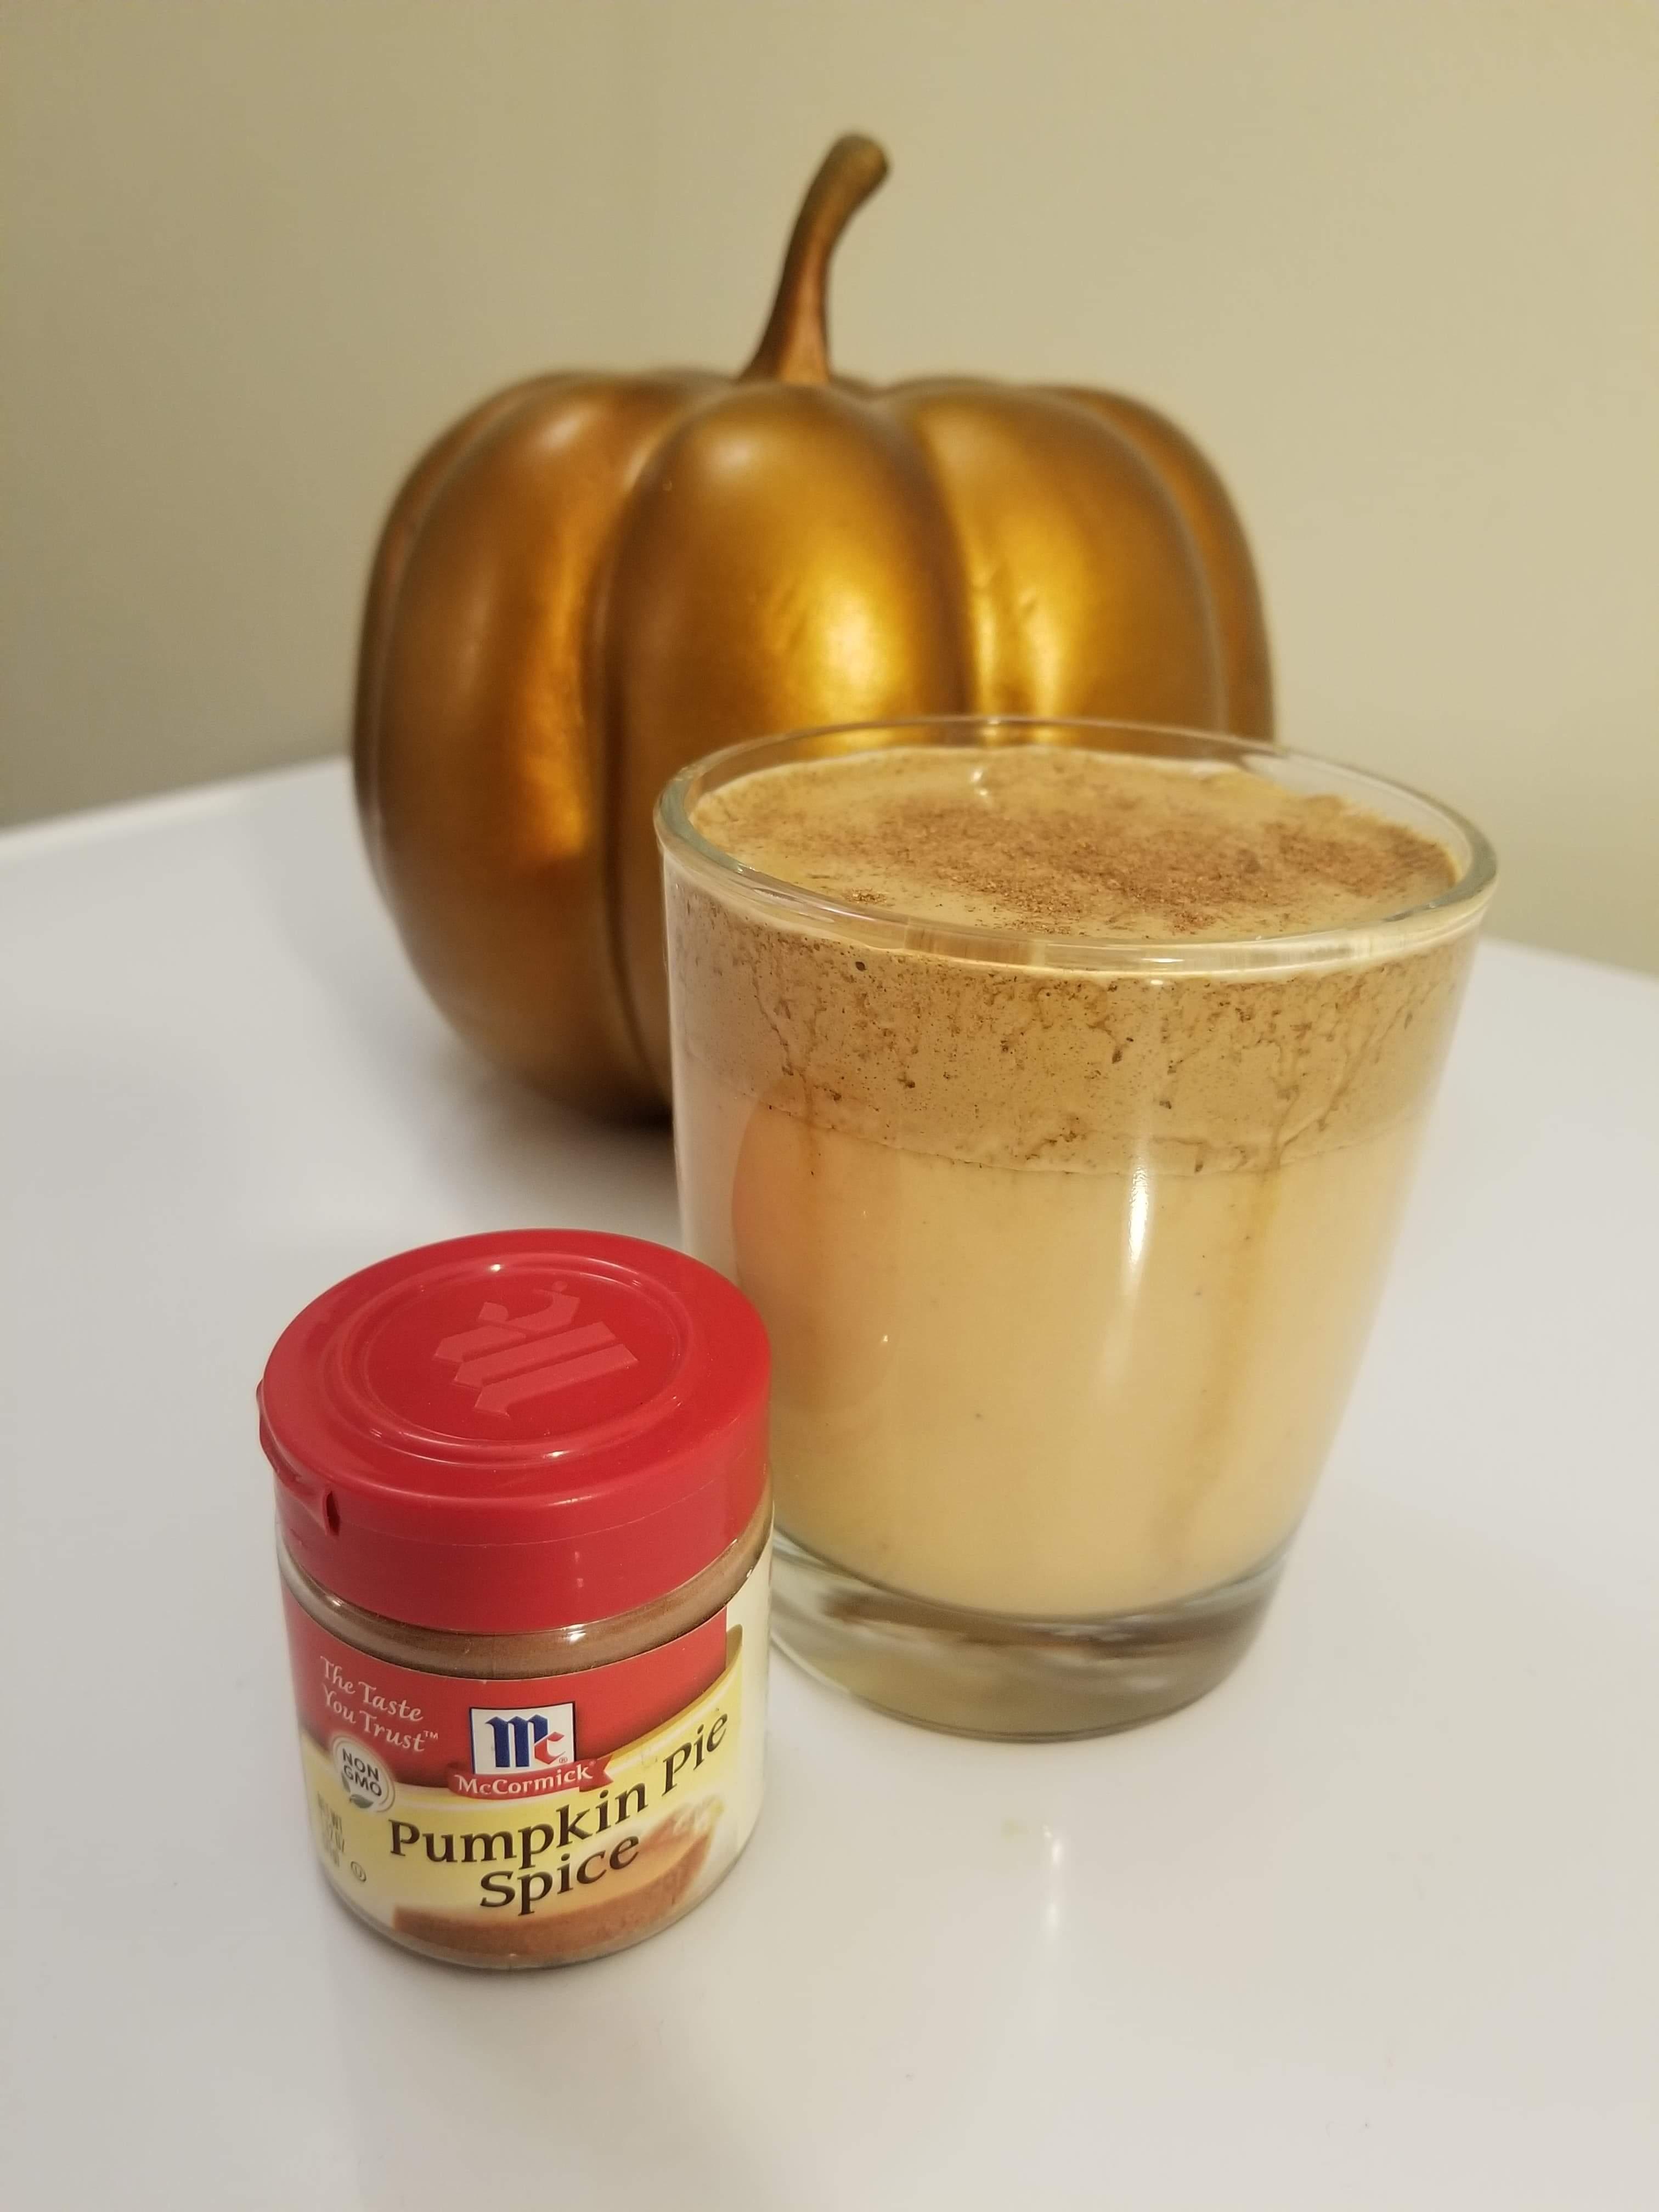 Whipped Pumpkin Spice Coffee